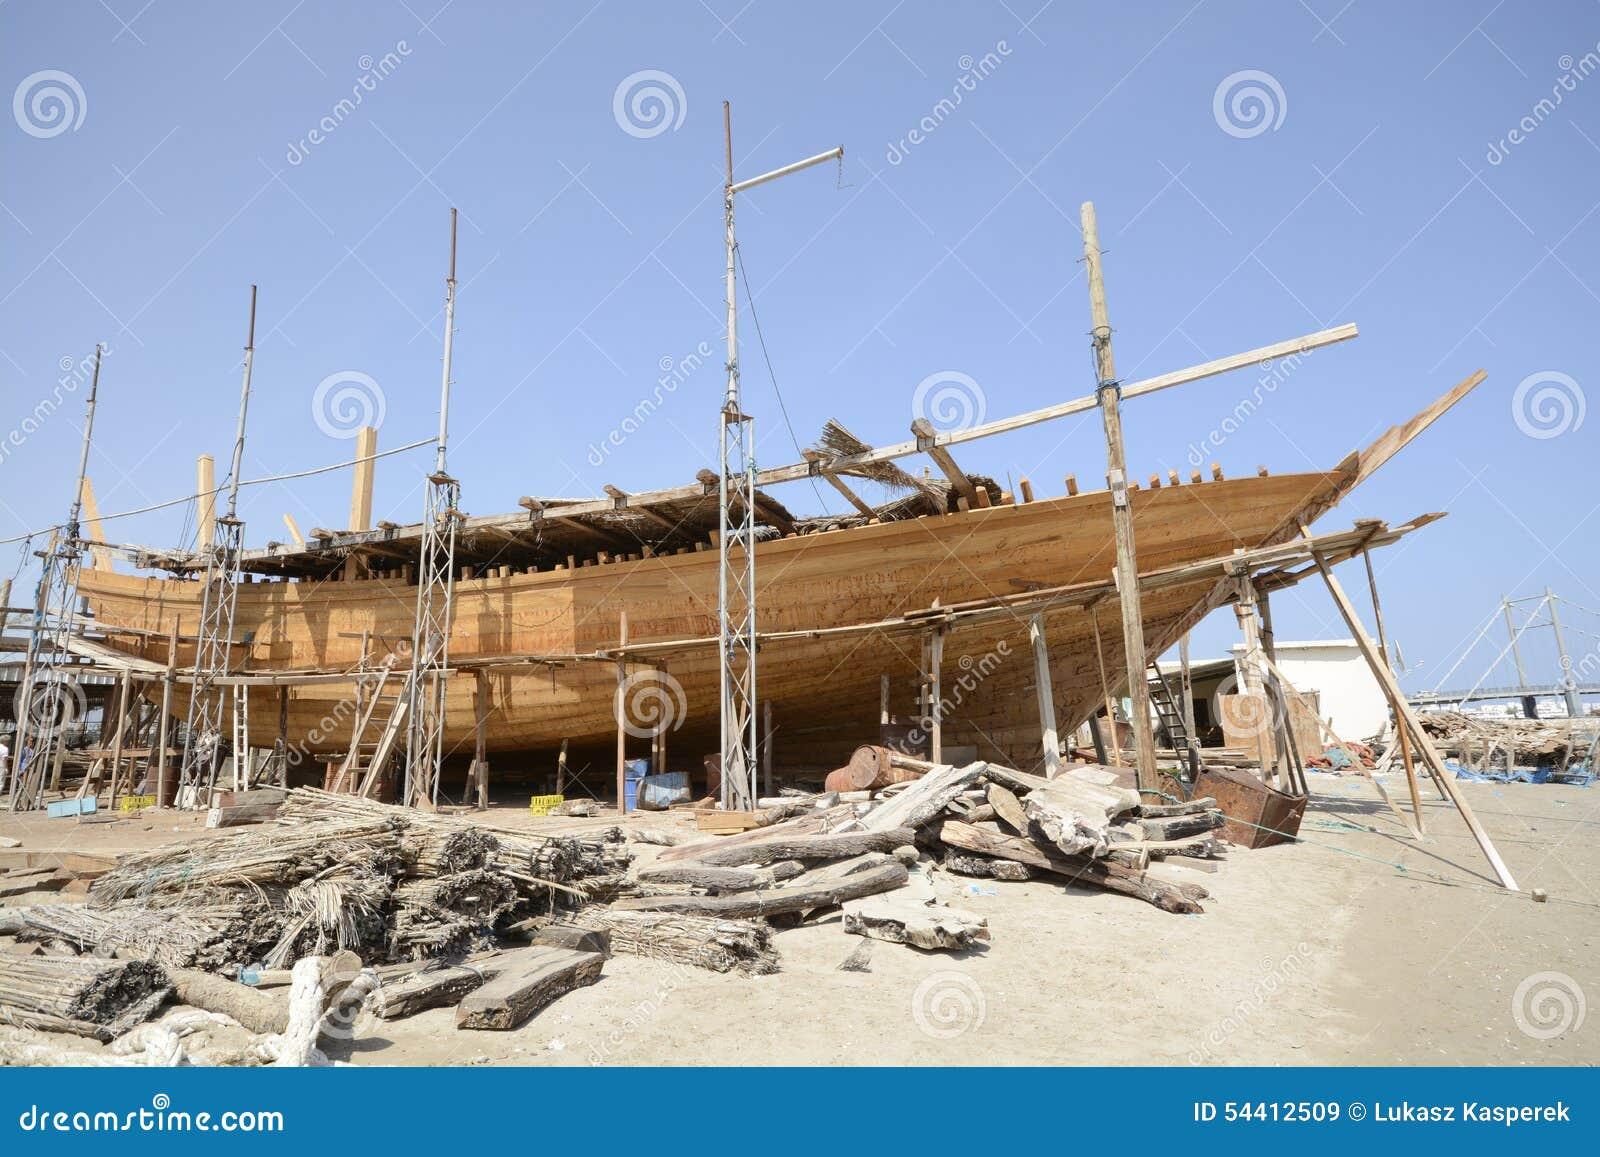 Traditional shipbuilding in Oman